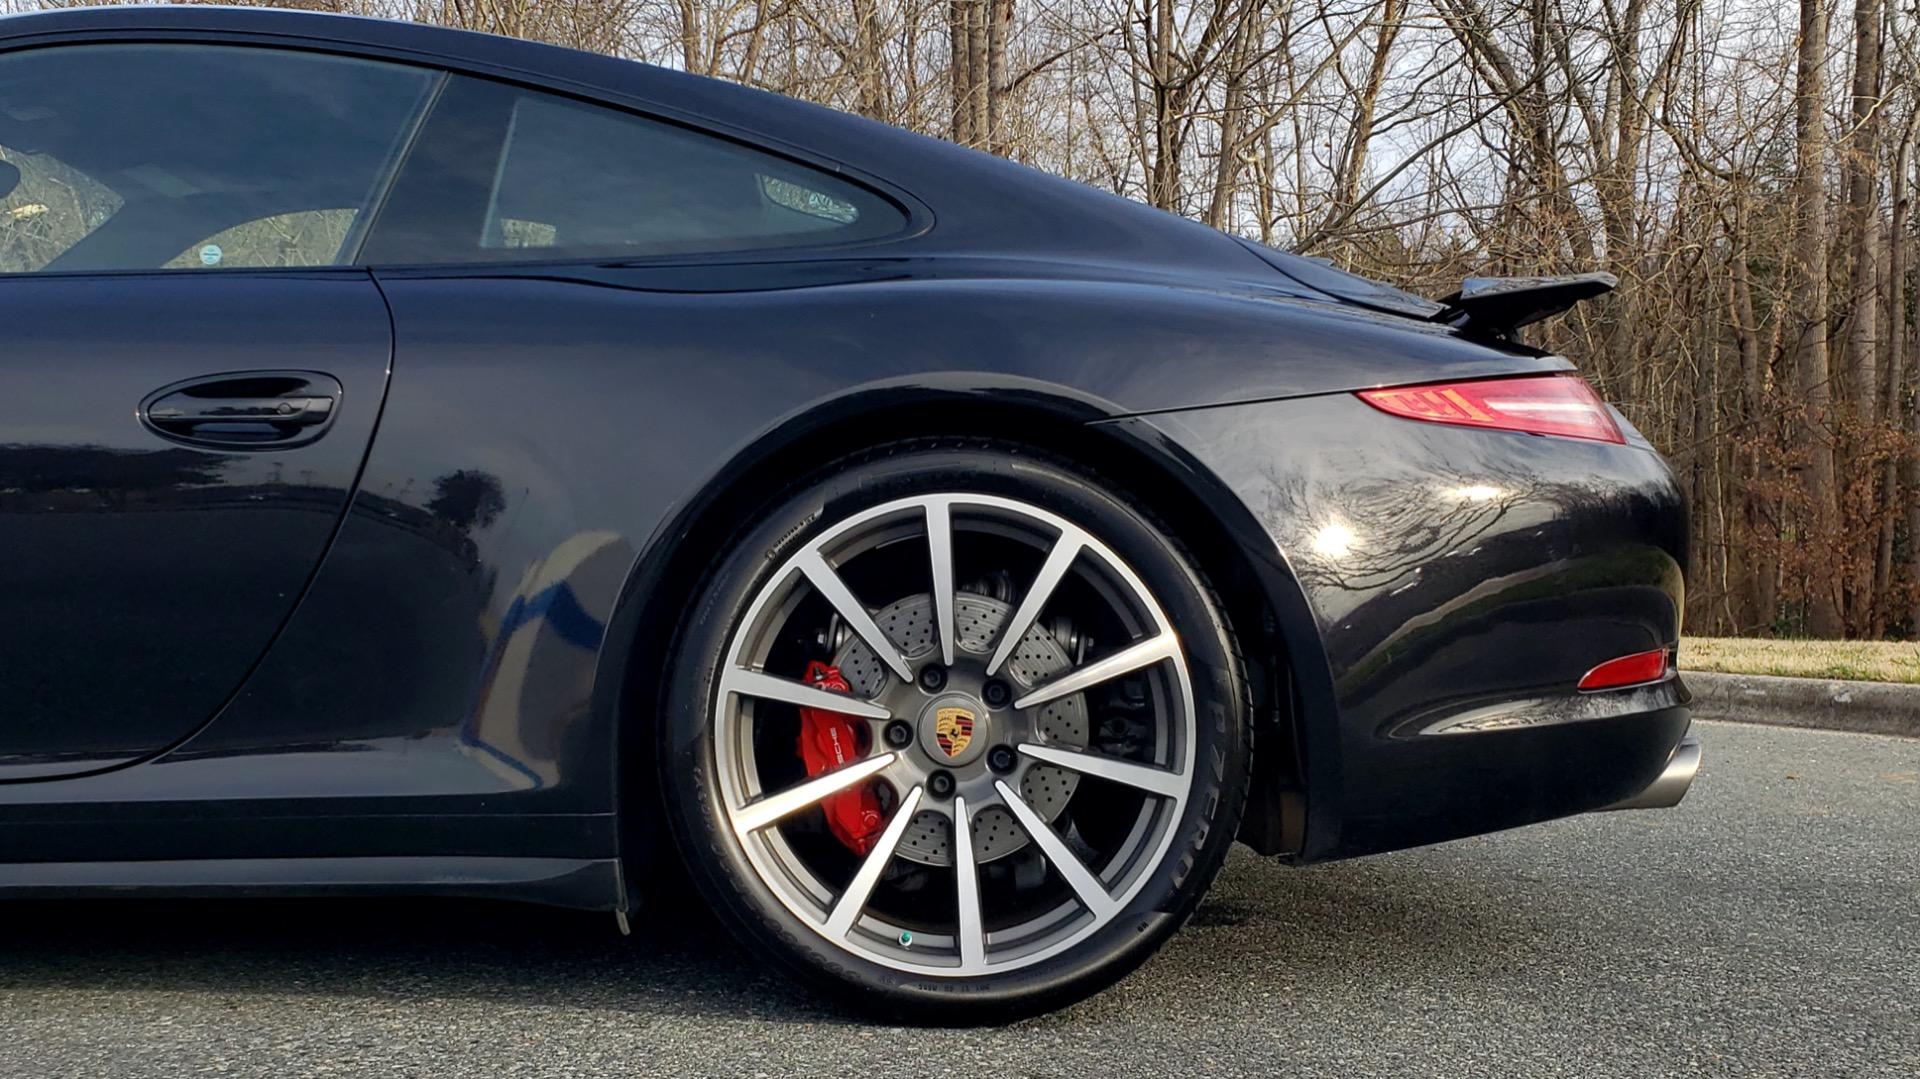 Used 2014 Porsche 911 CARRERA 4S / PREM PKG PLUS / NAV / SUNROO / BOSE / CHRONO for sale Sold at Formula Imports in Charlotte NC 28227 71